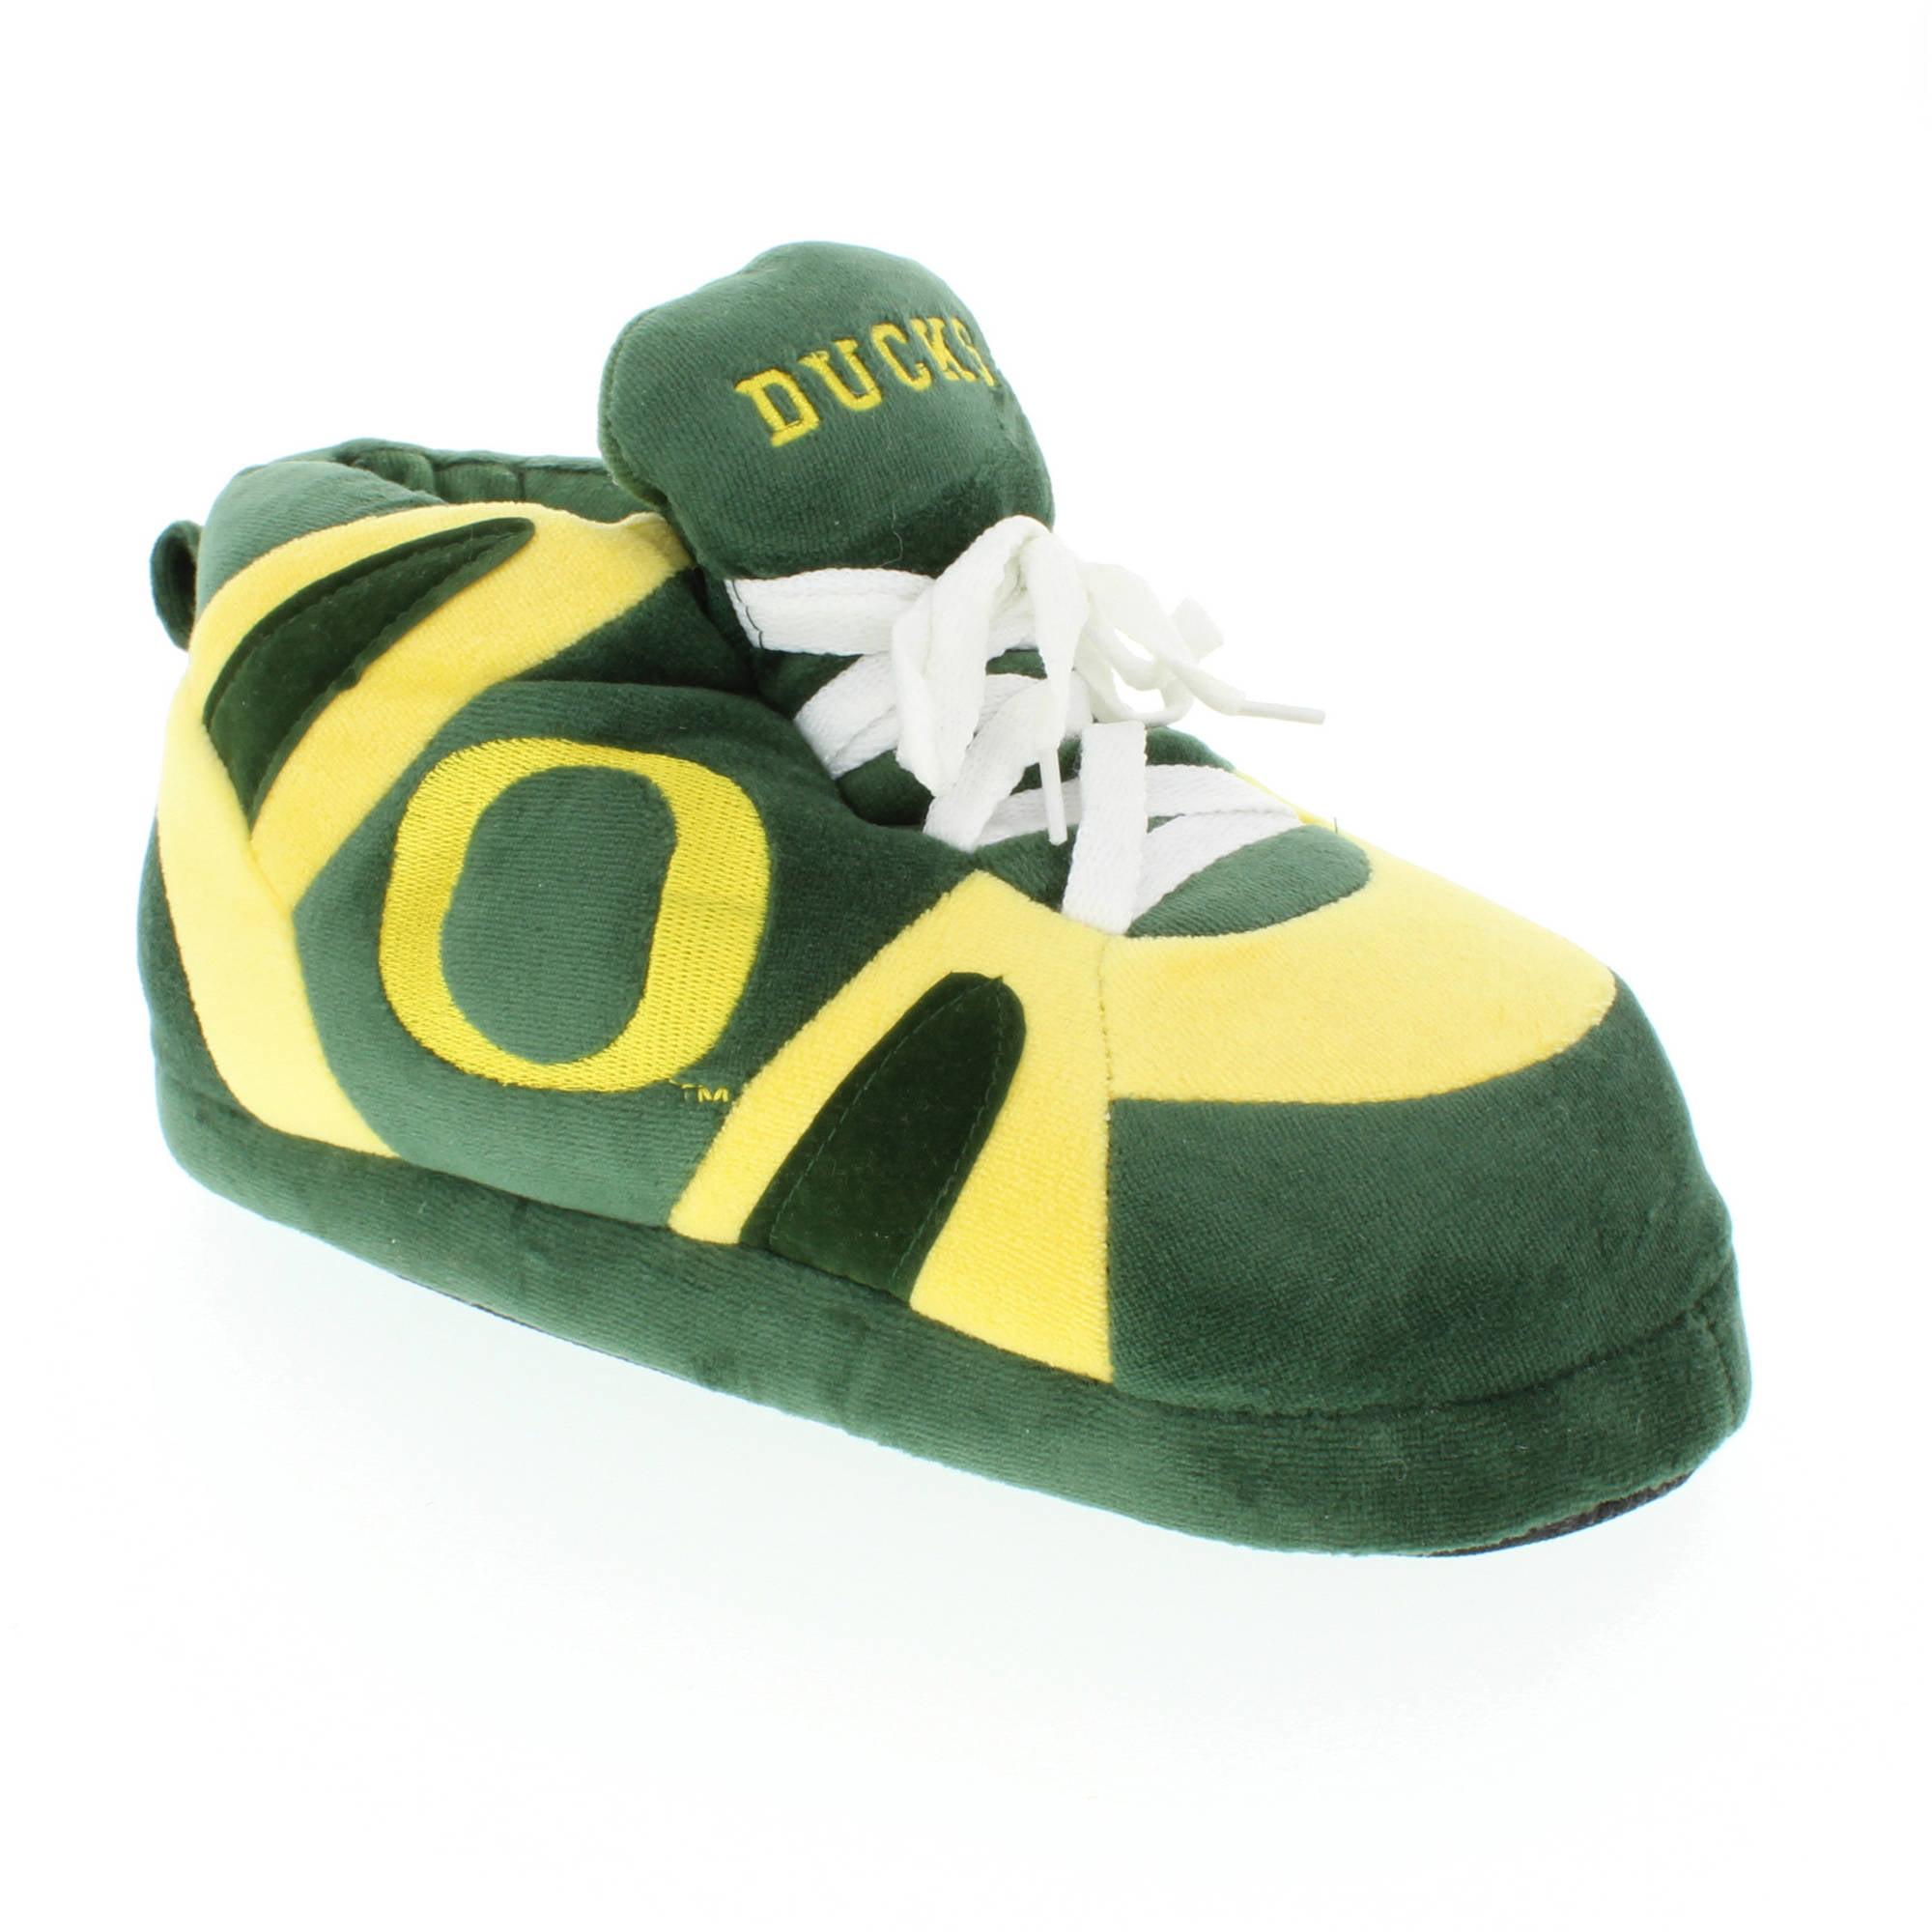 Comfy Feet - NCAA Oregon Ducks Slipper